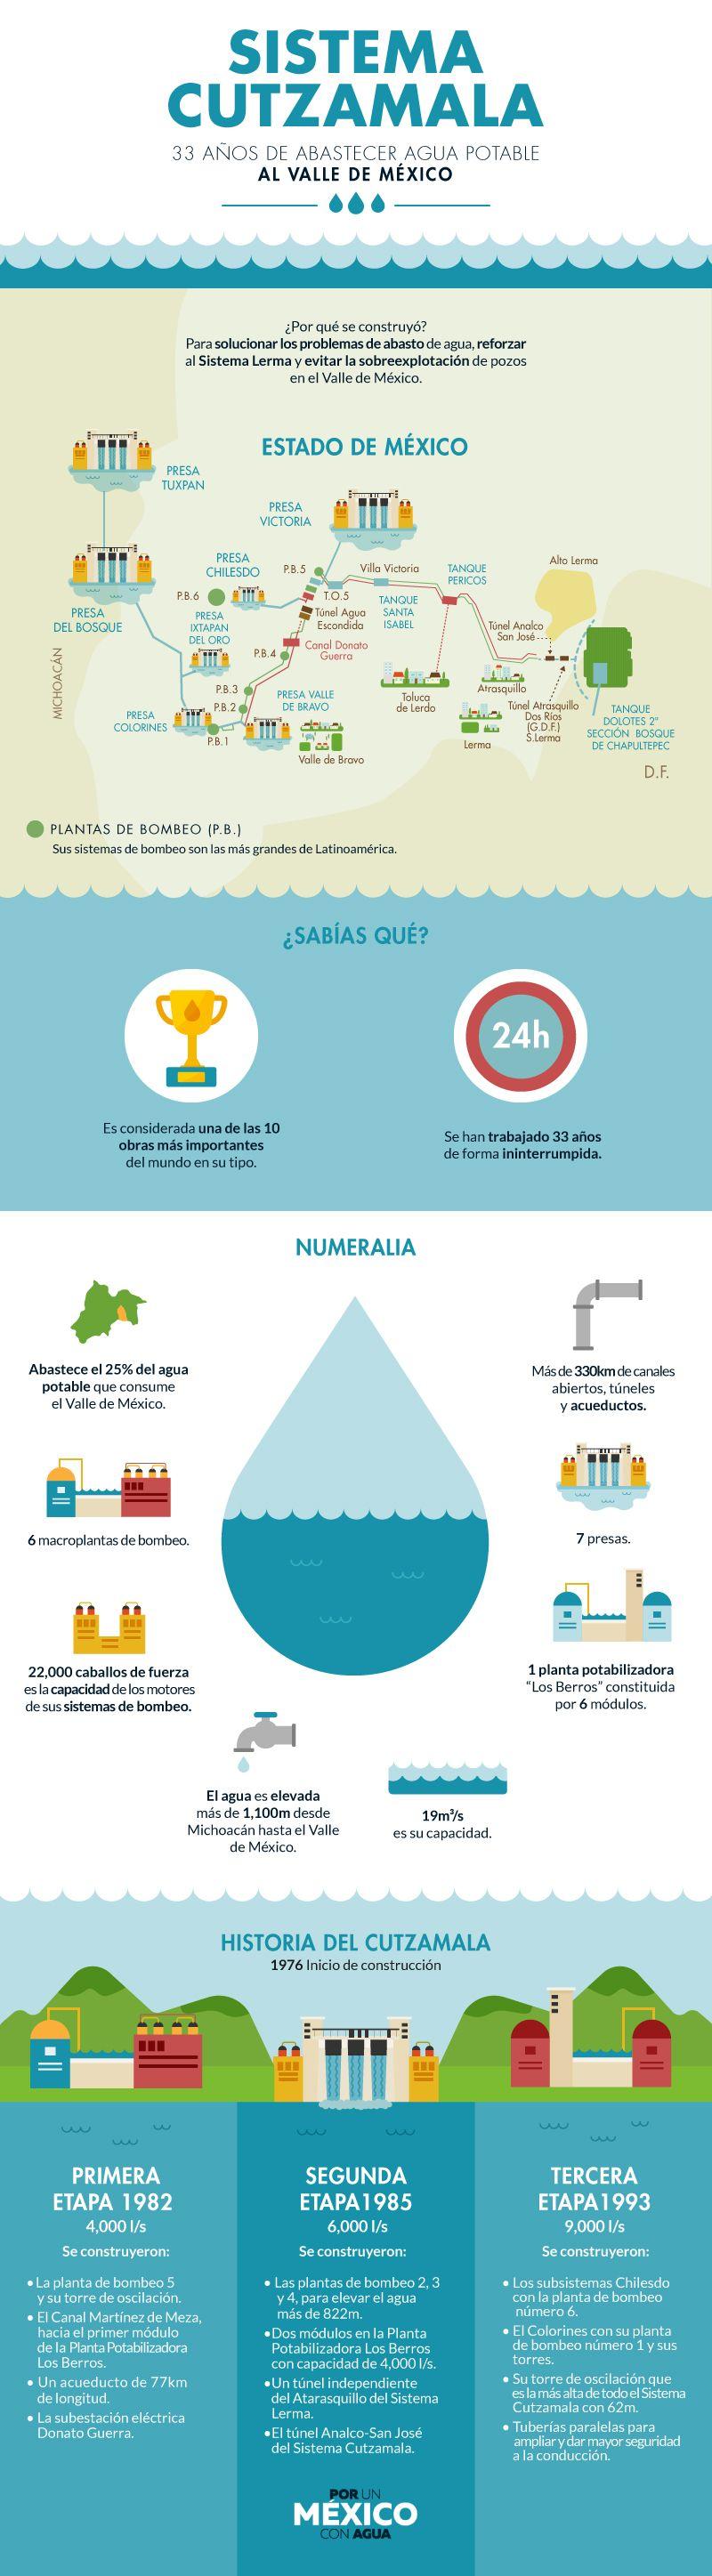 Sistema Cutzamala: 33 años de abastecer agua potable al valle de México